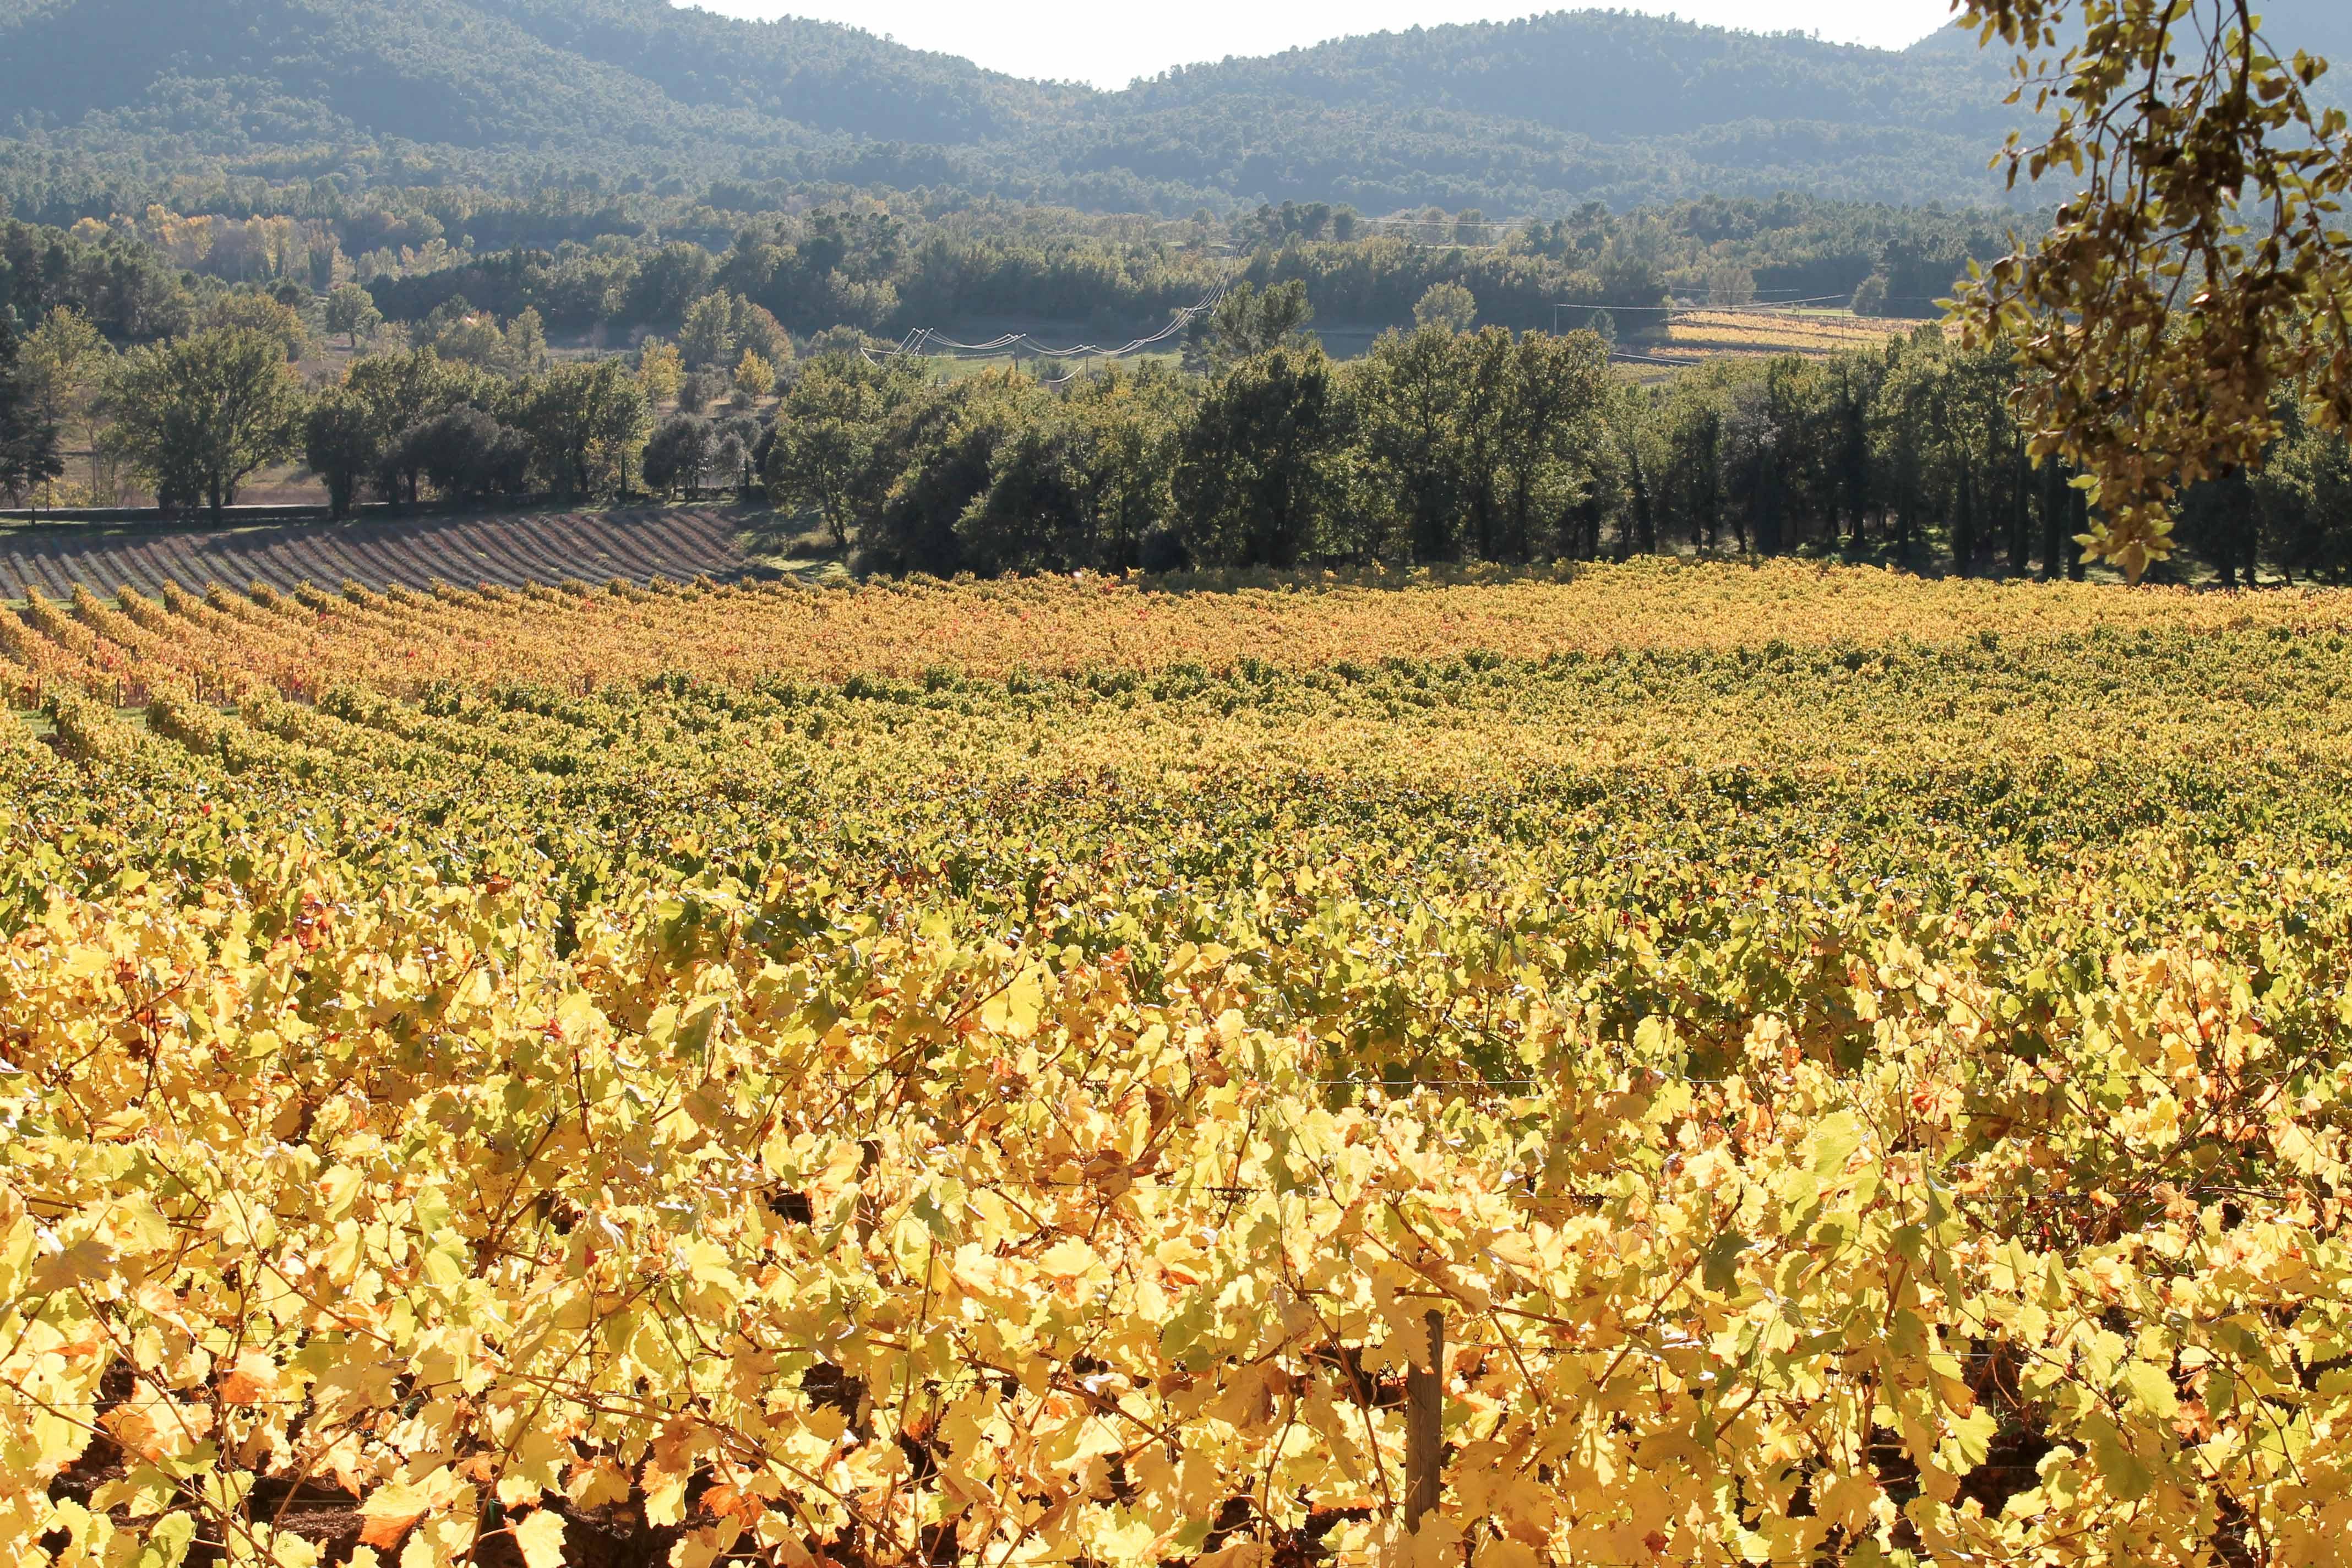 Aix en Provence wine tour, full view on vineyard